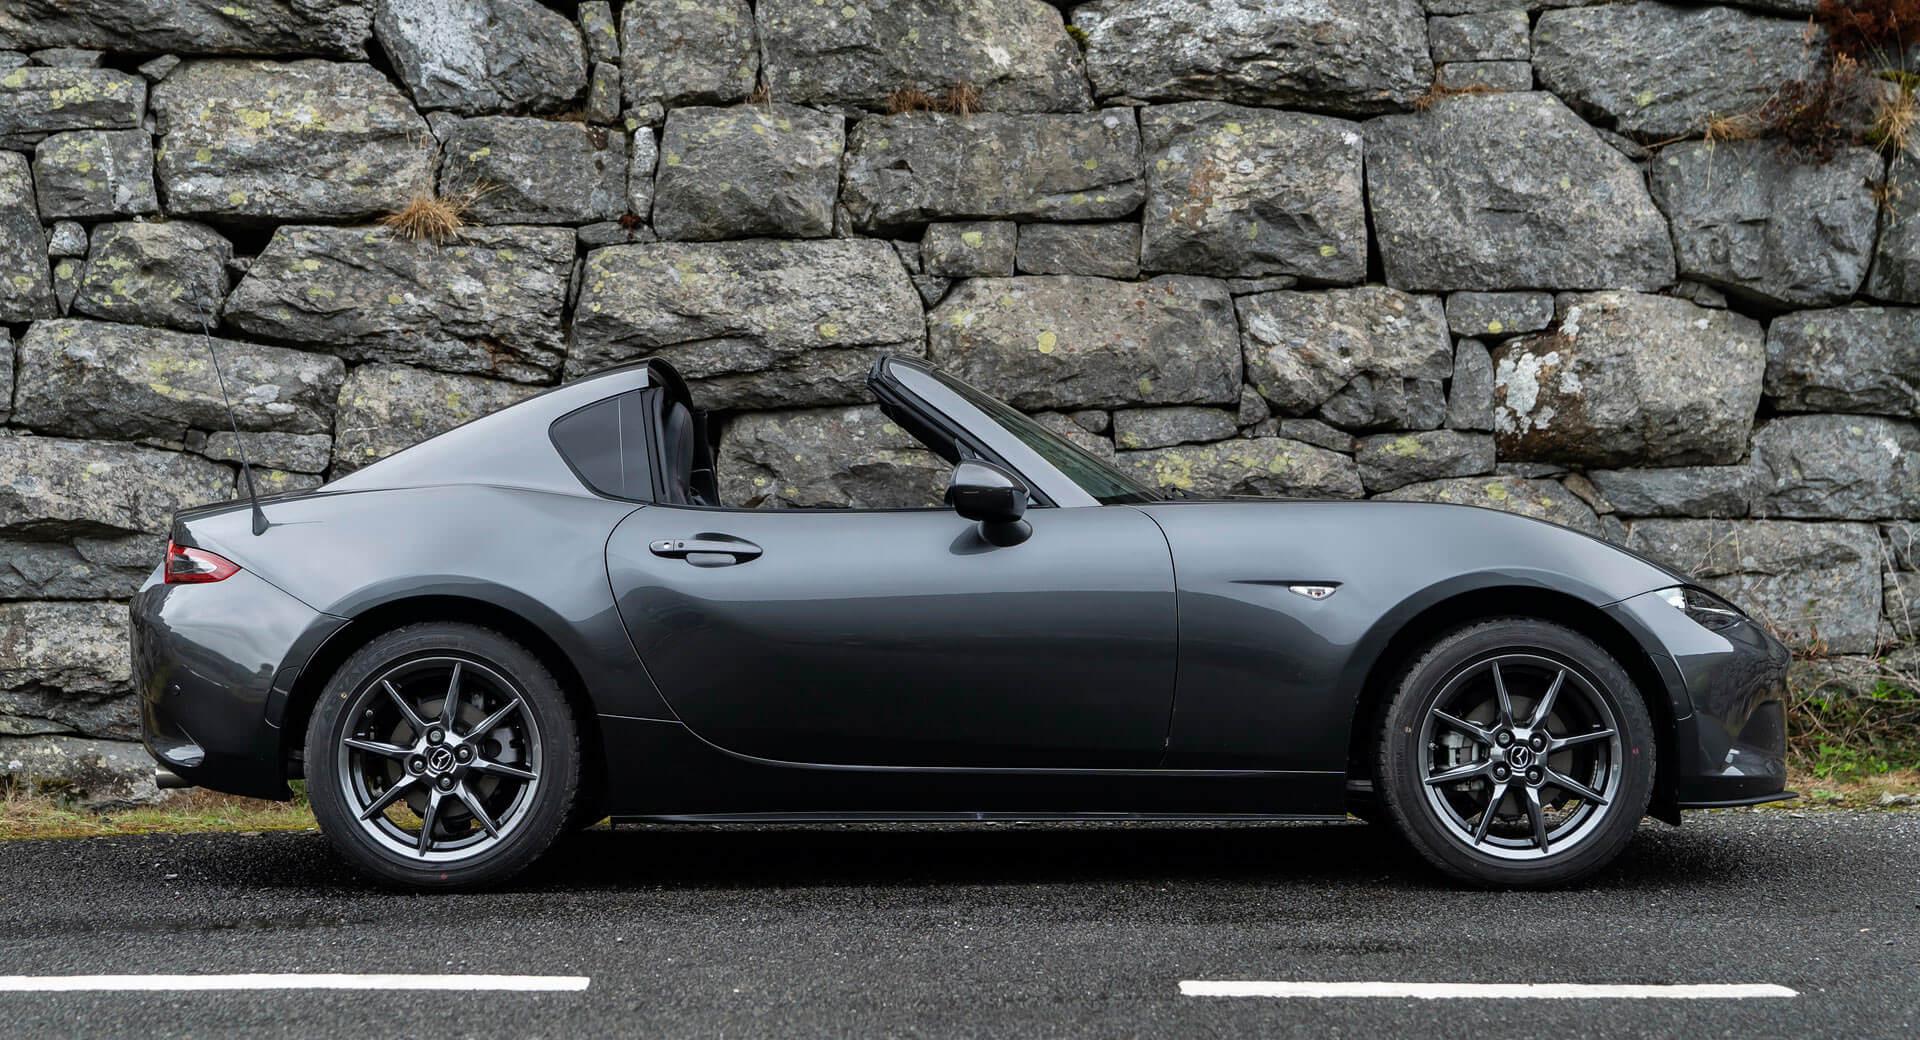 Kelebihan Kekurangan Harga Mazda Mx5 Murah Berkualitas